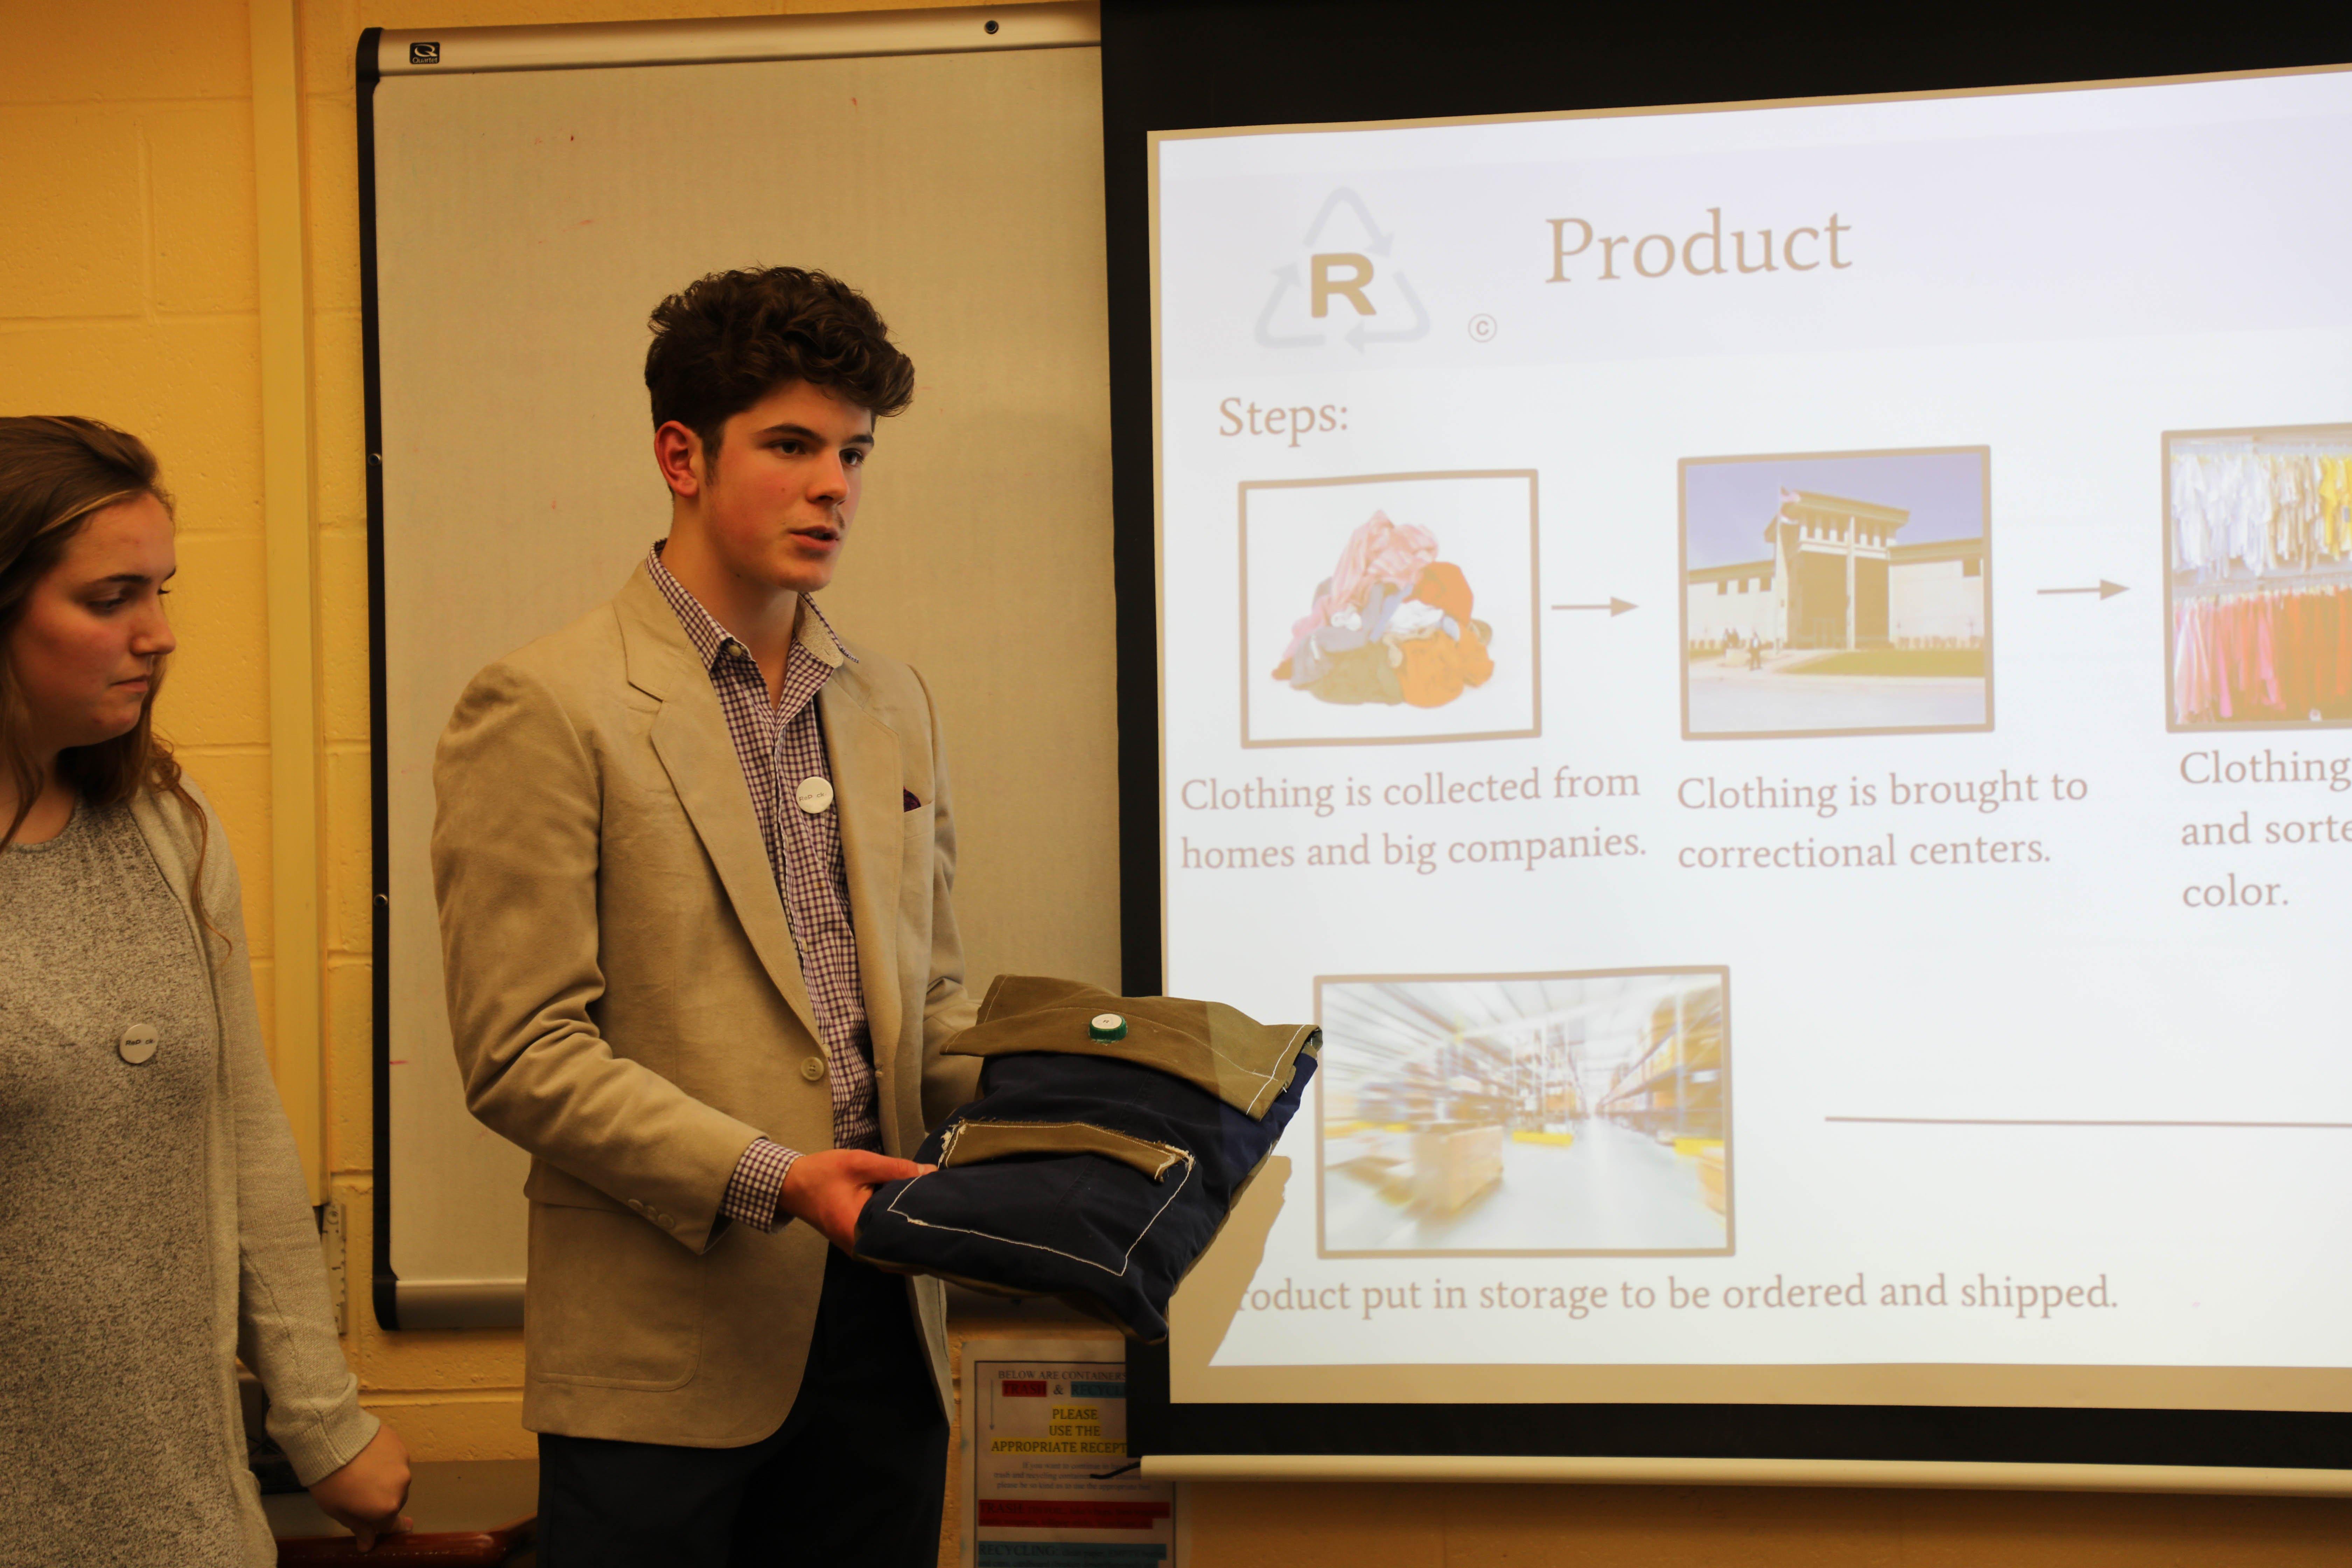 Proctor Academy Innovation and Entrepreneurship Boarding School